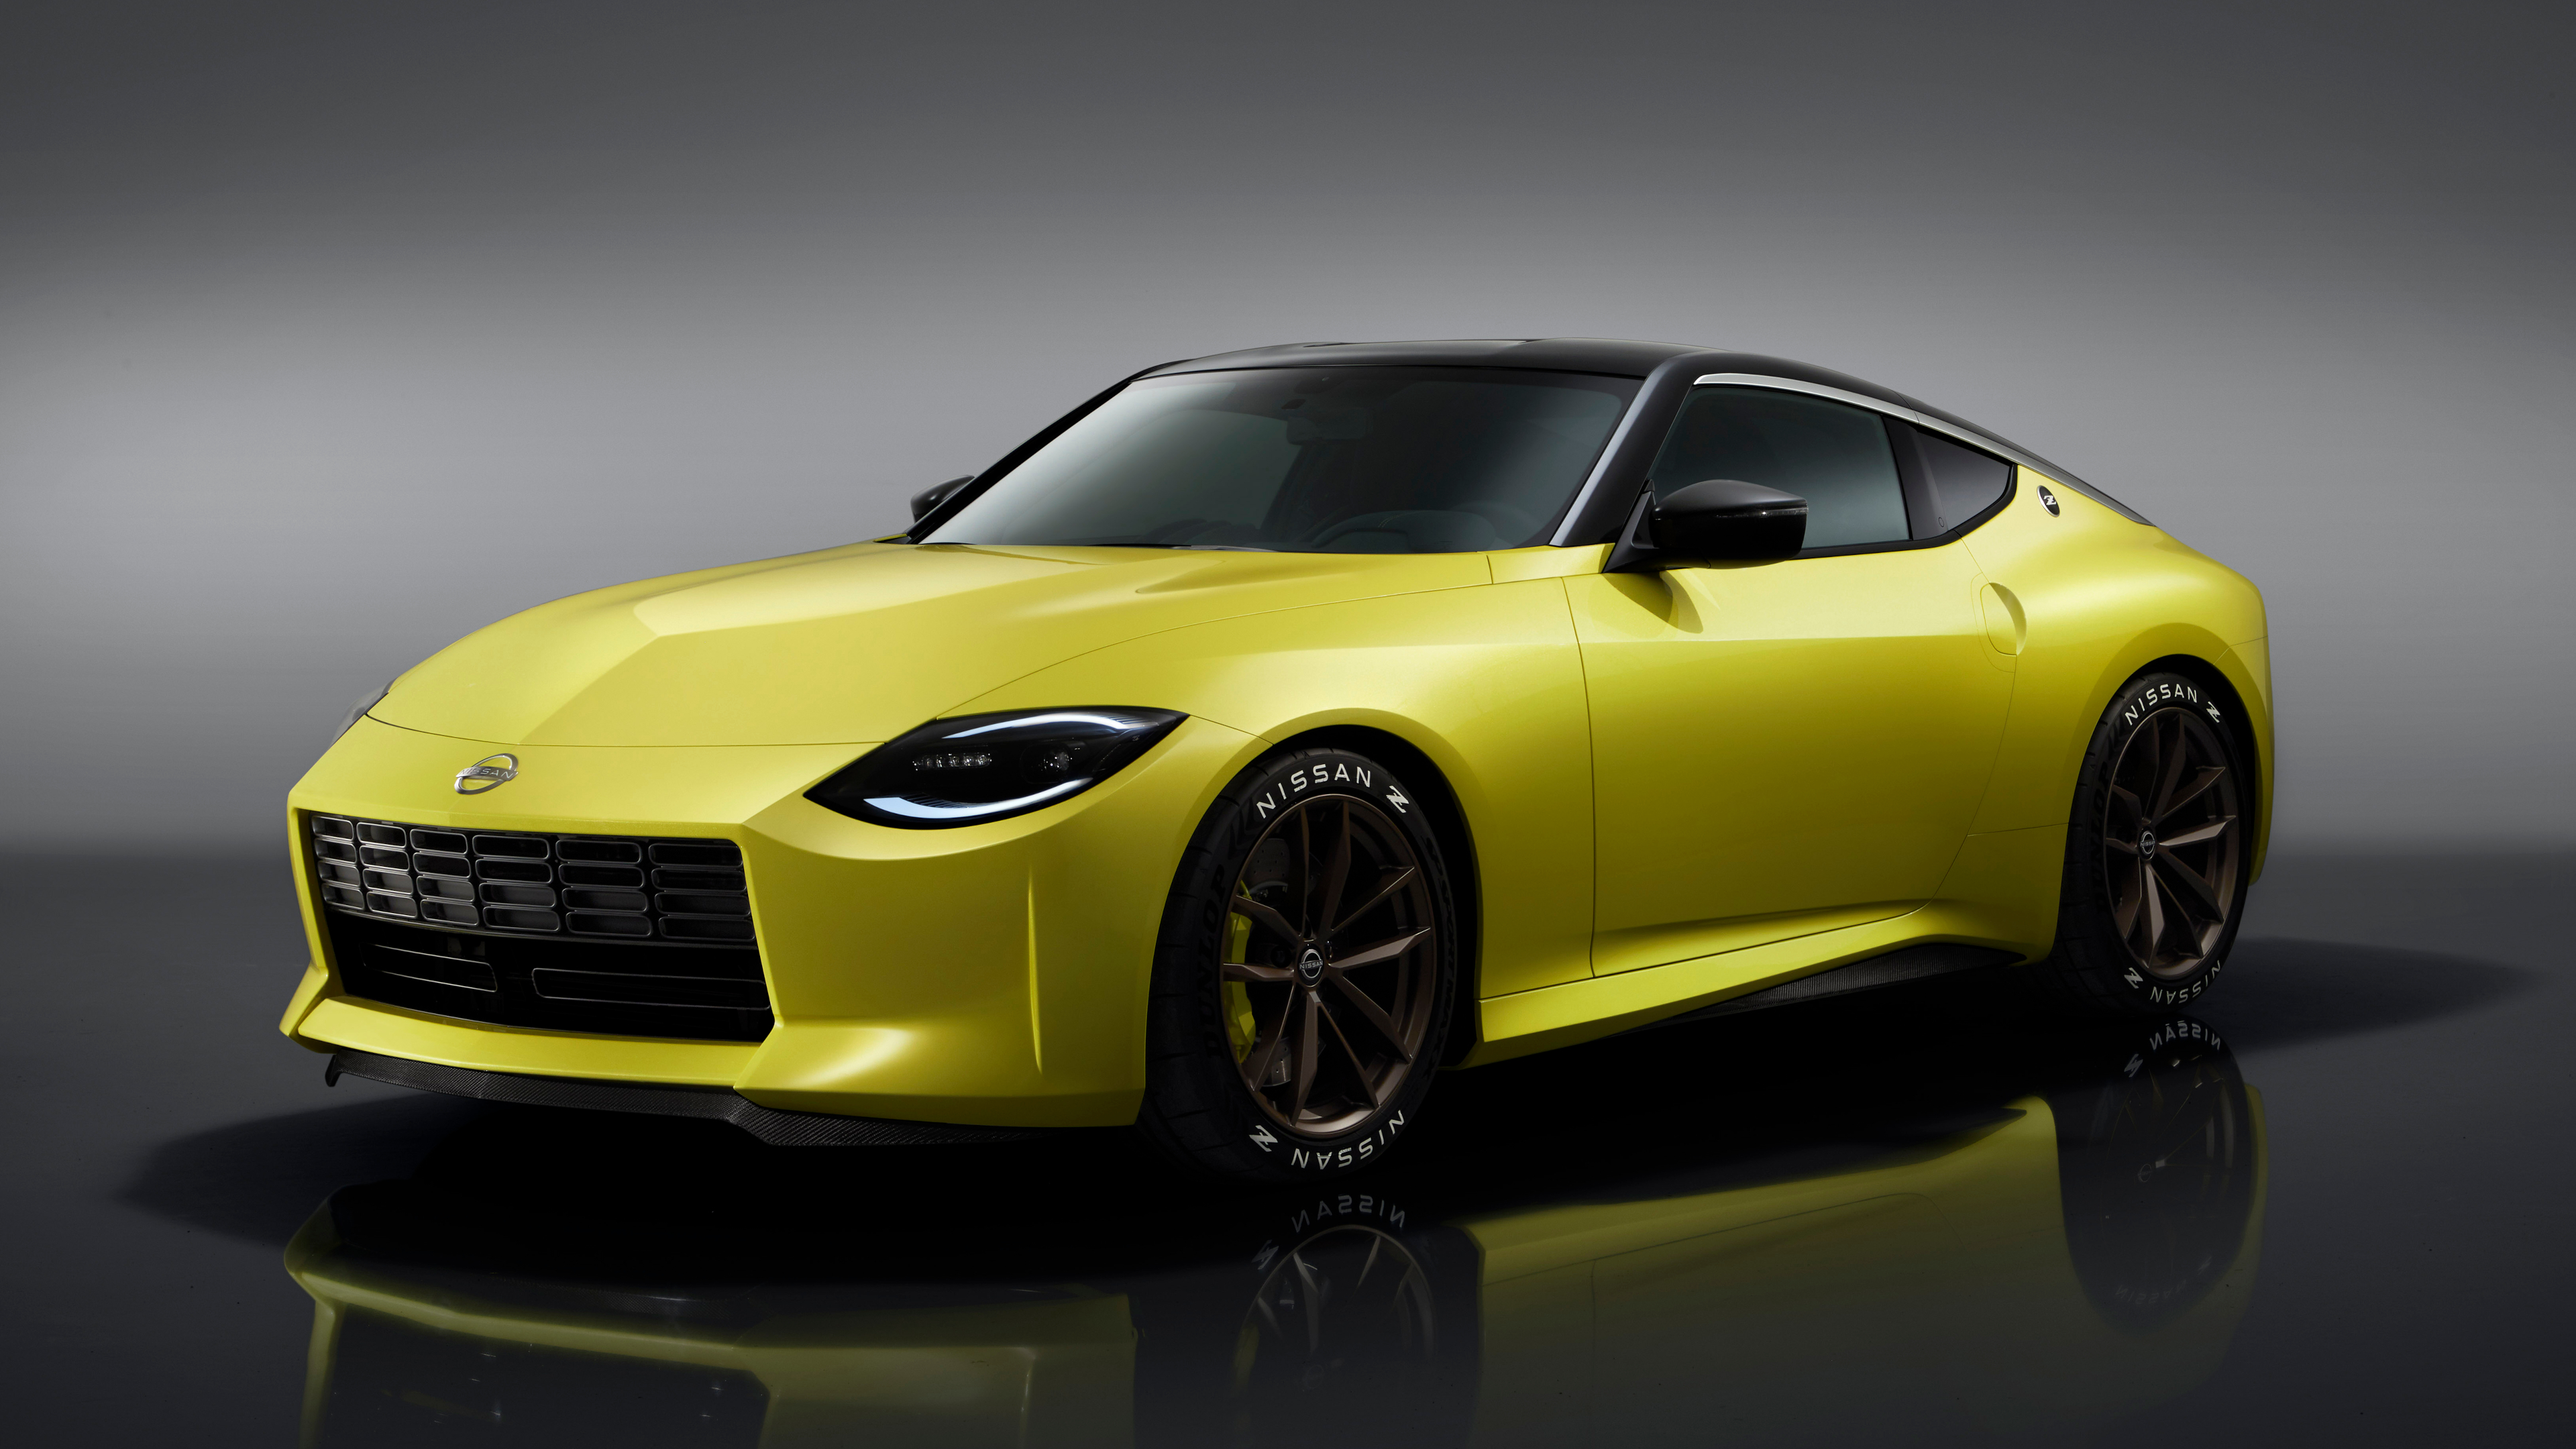 Nissan 400Z Nissan Car Vehicle Yellow Cars Sports Car 3840x2160